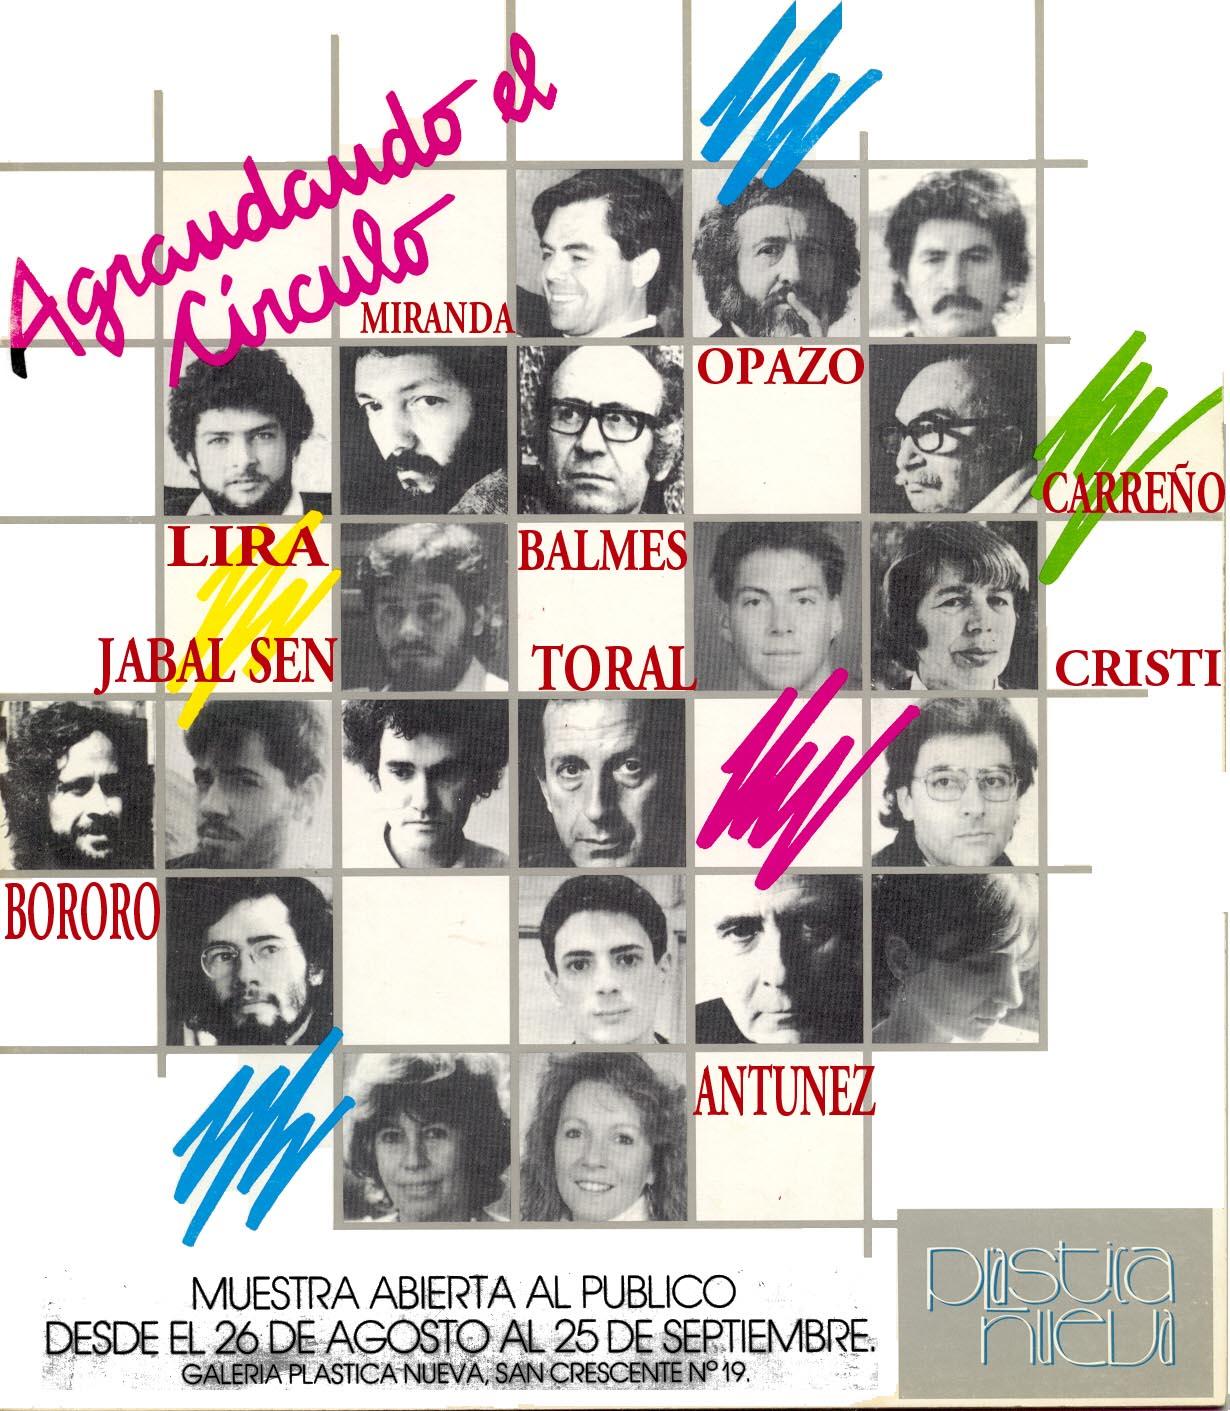 AGRANDANDO_CIRCULO.jpg